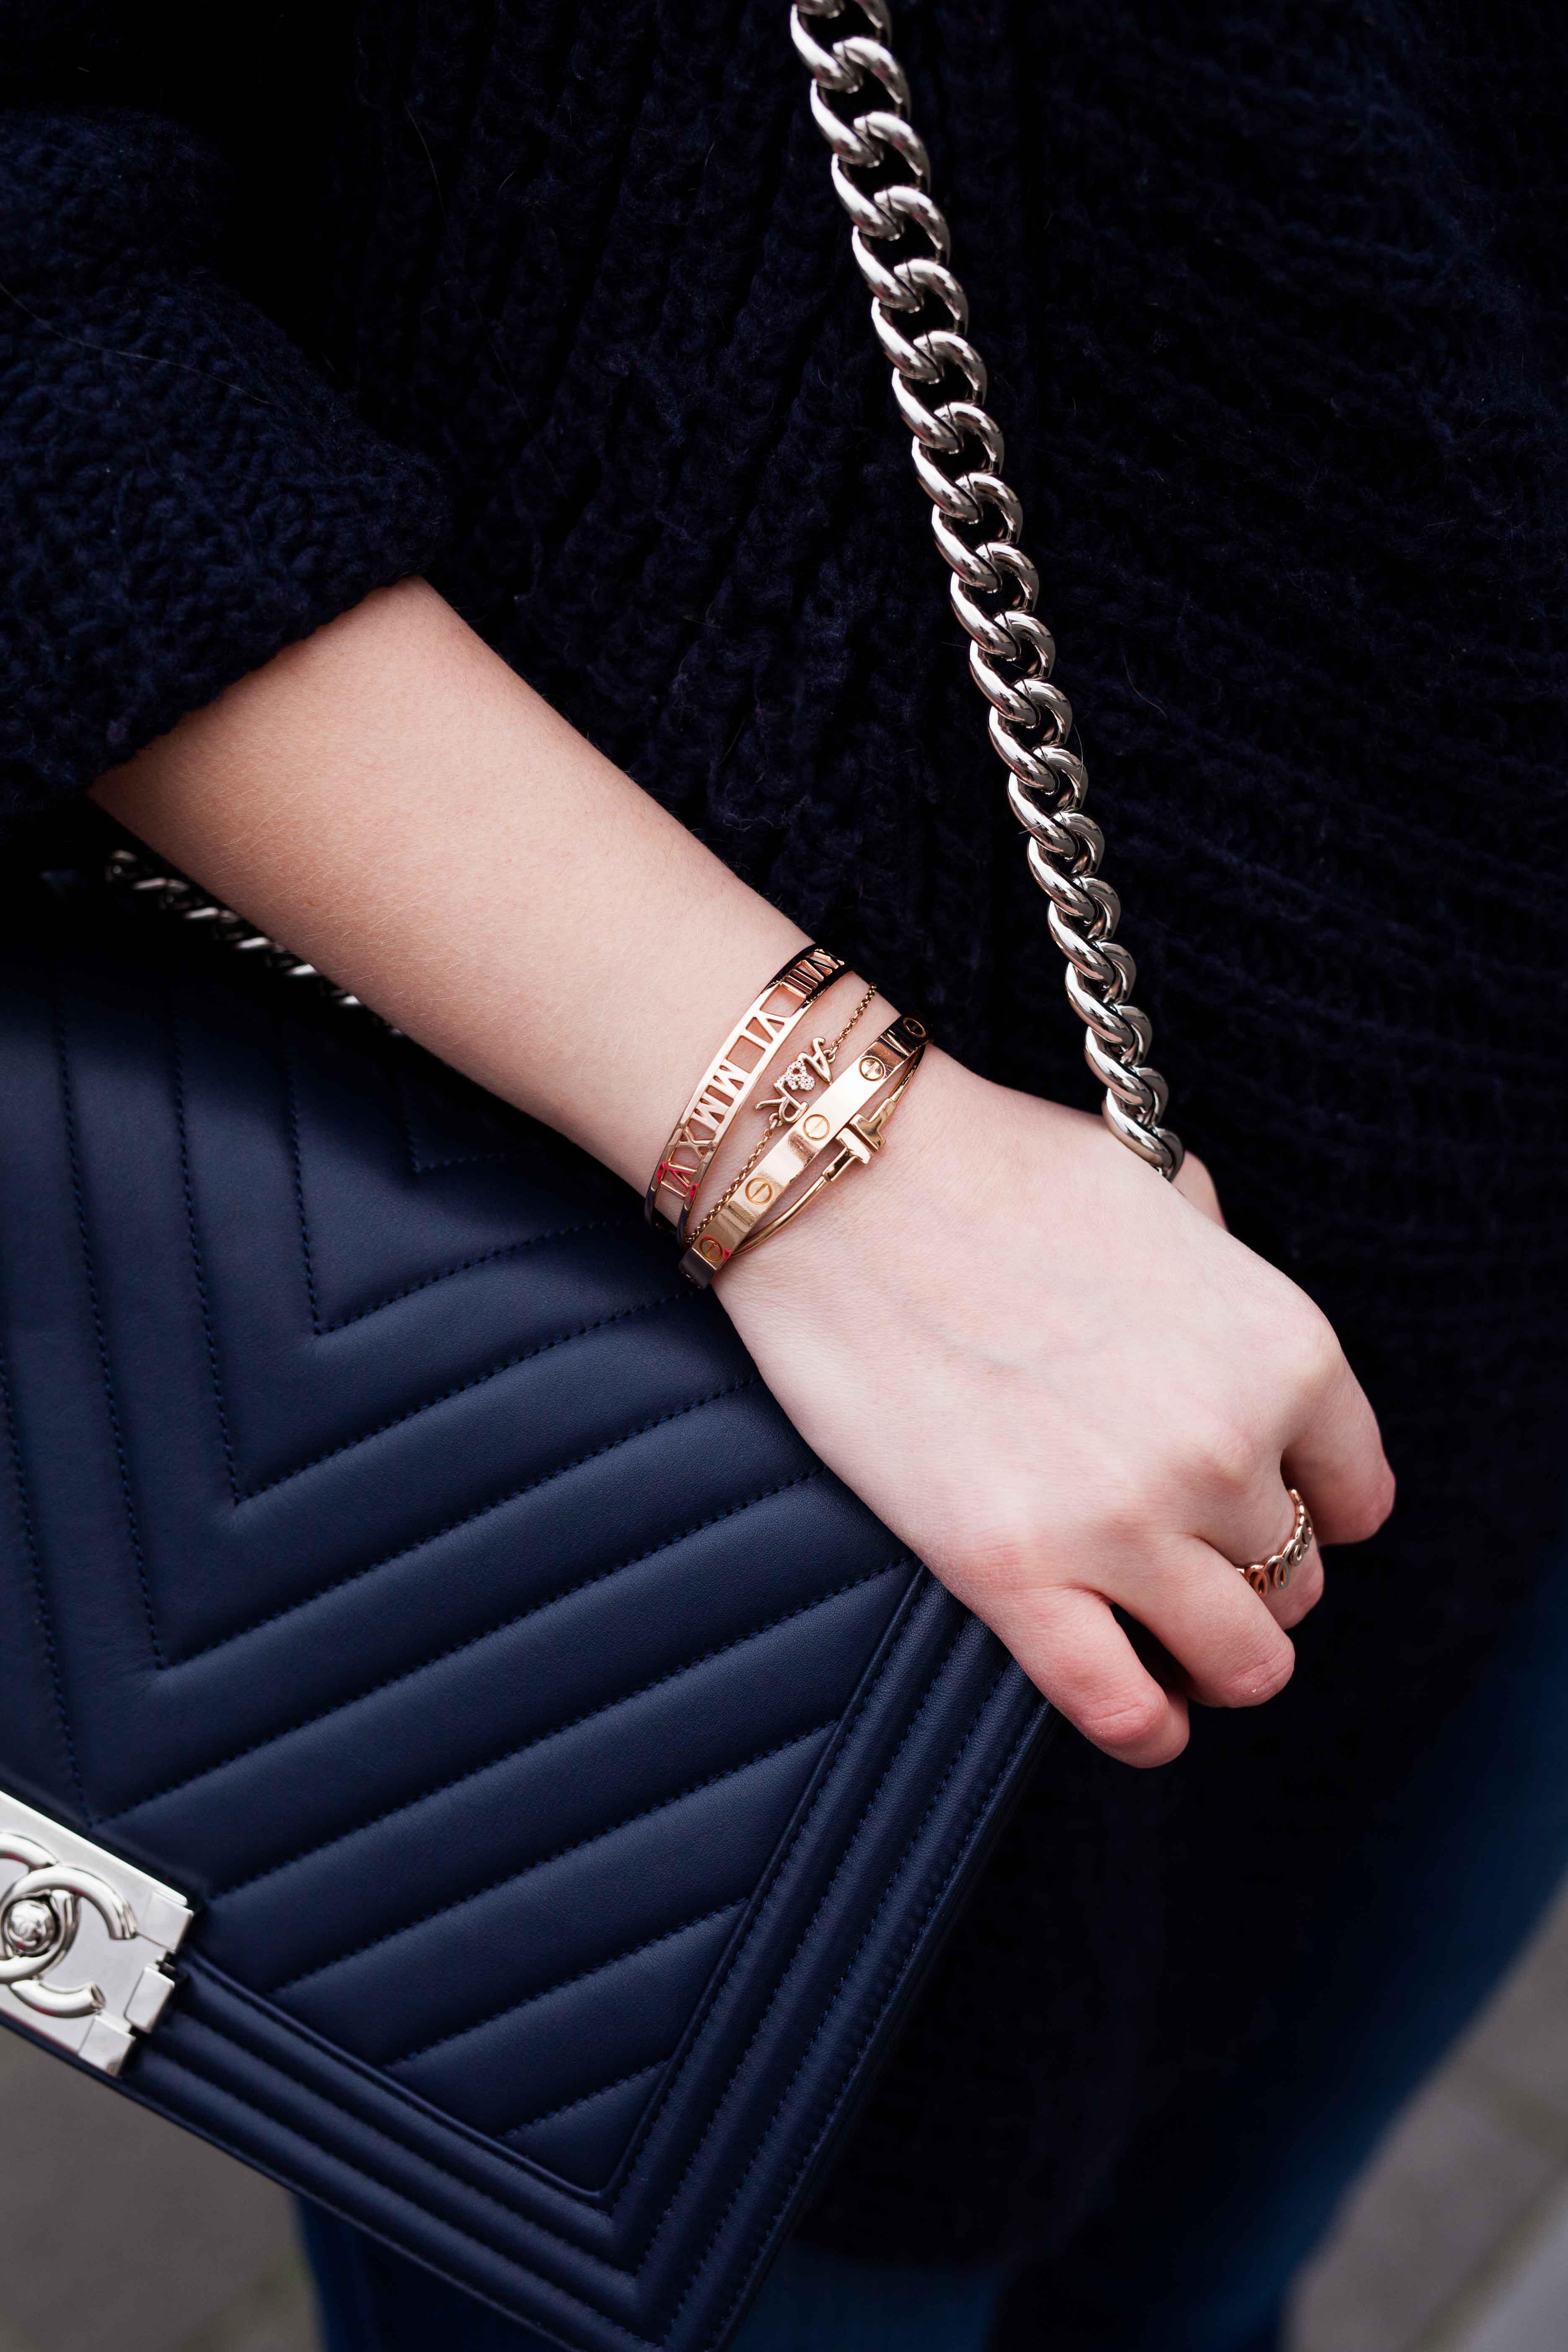 Chanel boy bag & Cartier bracelet